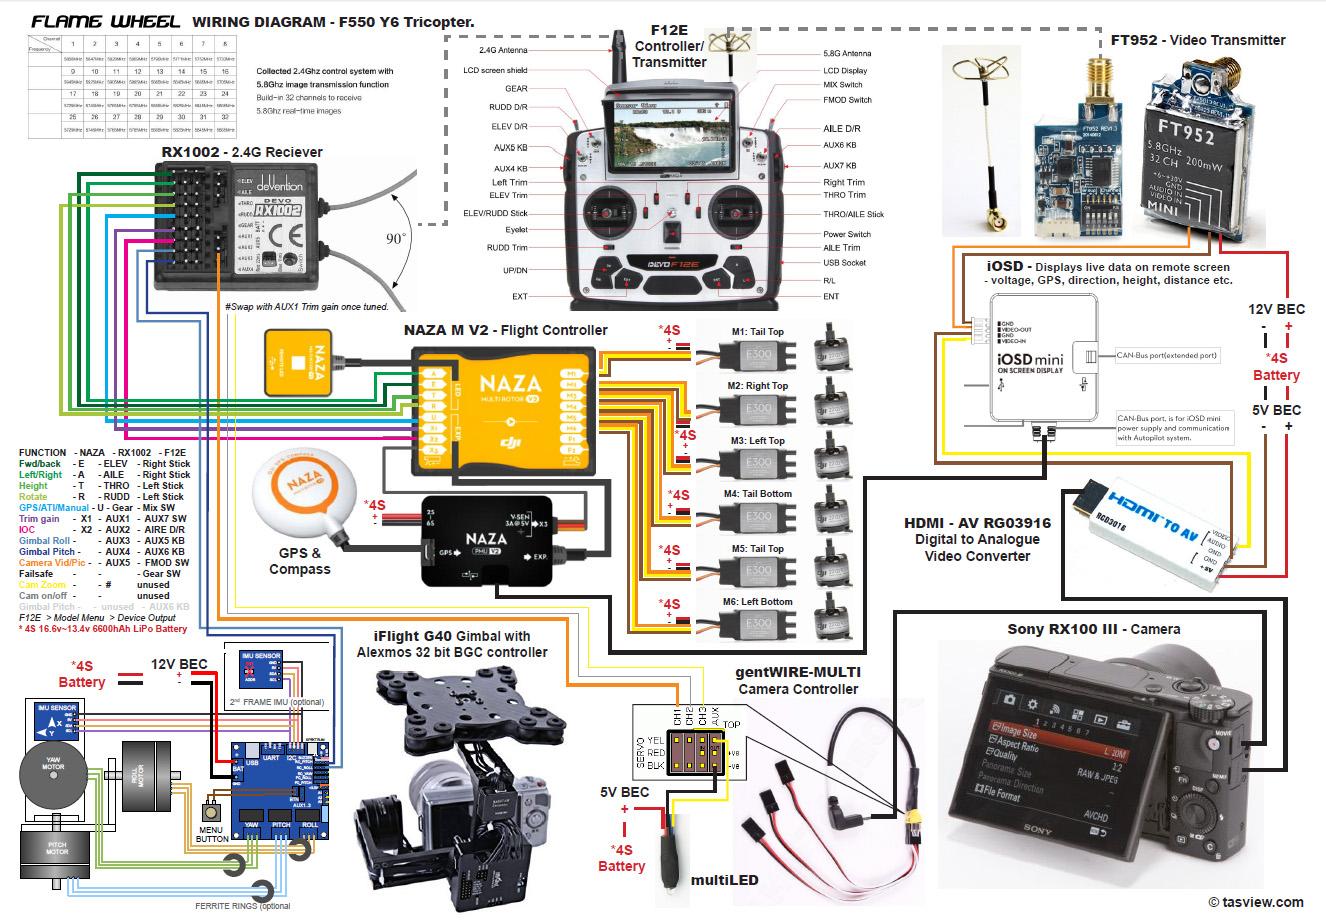 phantom 2 vision wiring diagram simple wiring diagrams house wiring circuits diagram phantom 2 vision wiring [ 1326 x 920 Pixel ]